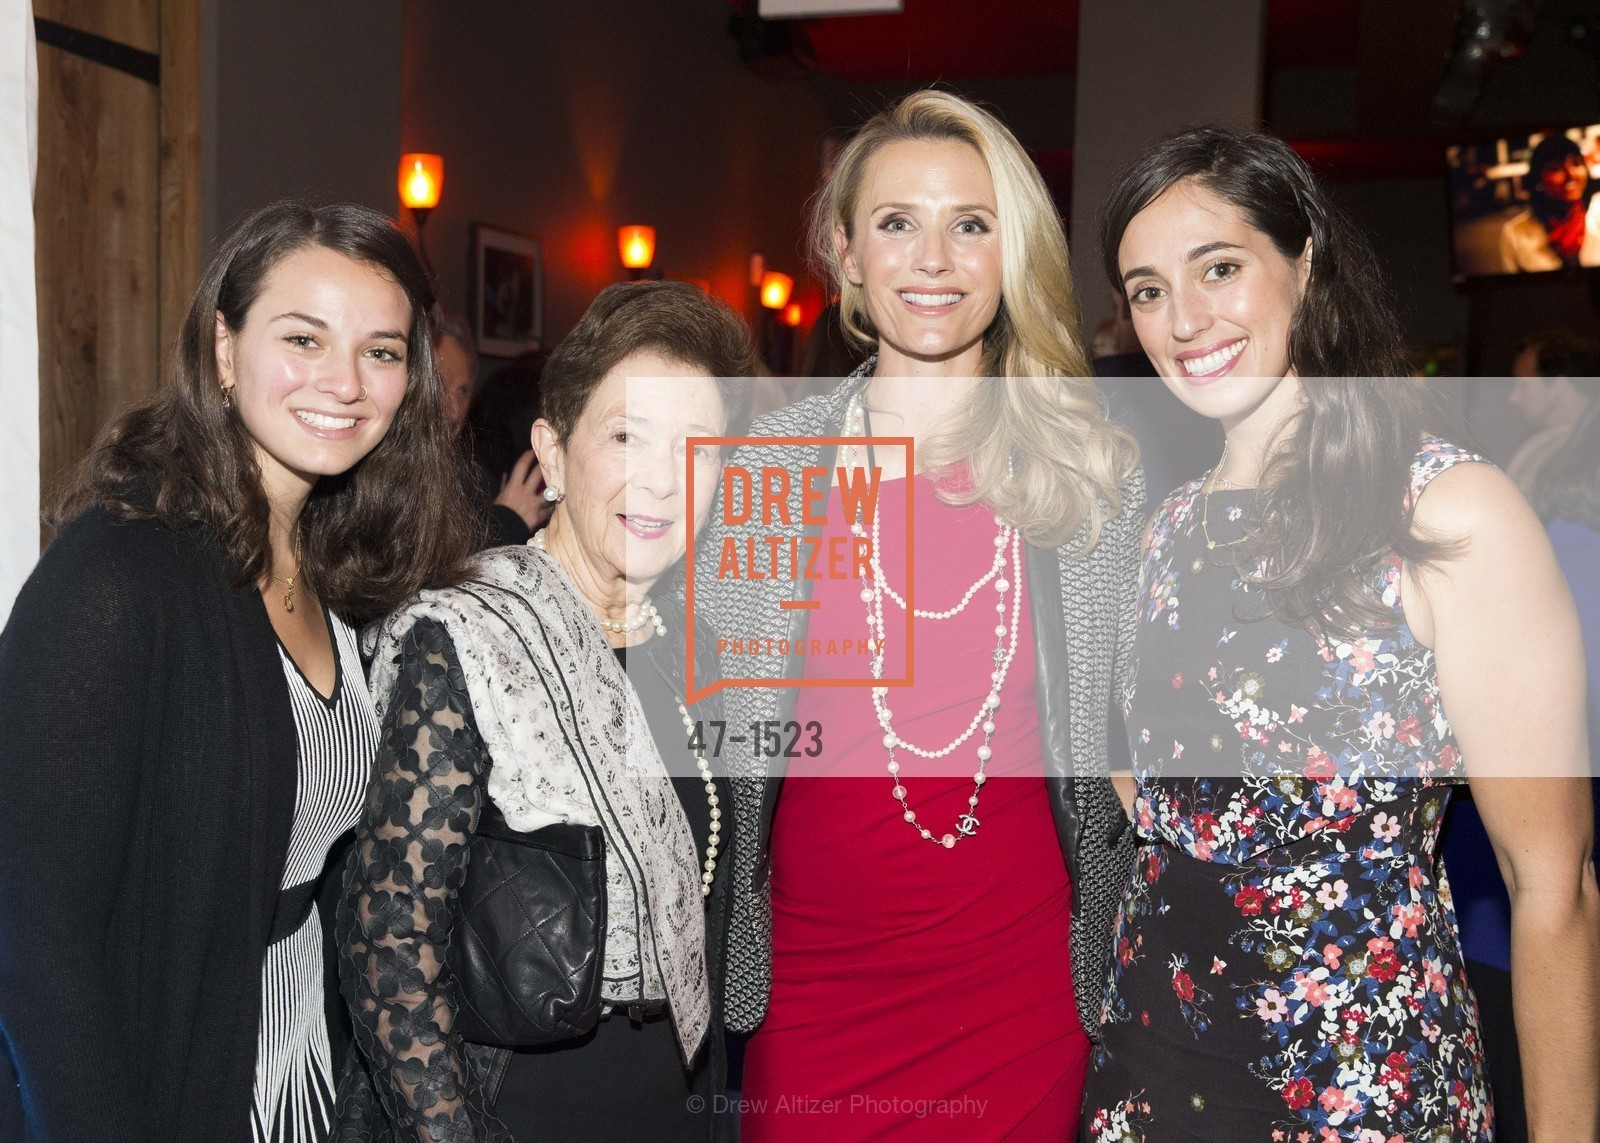 Roselyne Swig, Jennifer Siebel Newsom, Lindsey Sedlack, Photo #47-1523